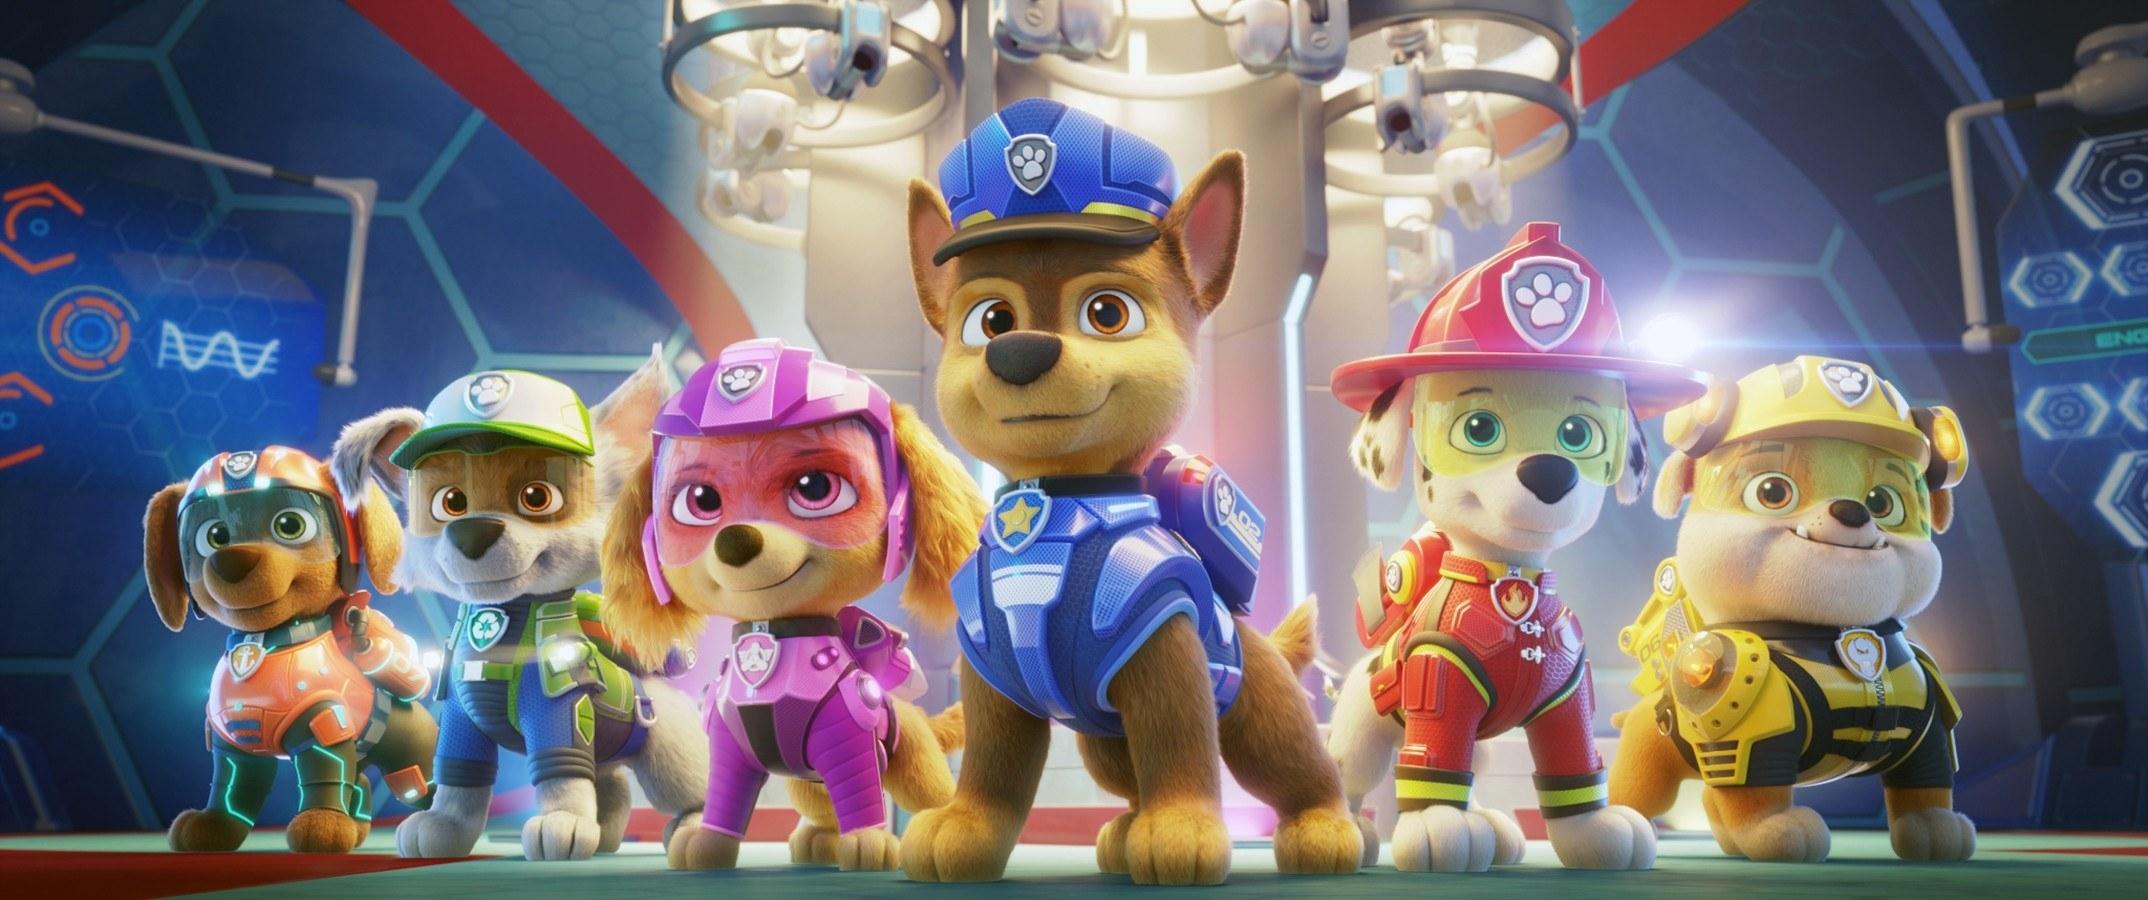 from left is the animated movie paw patrol starring Zuma (voice: Shayle Simons), Rocky (voice: Callum Shoniker), Skye (voice: Lilly Bartlam), Chase (voice: Iain Armitage), Marshall (voice: Kingsley Marshall), Rubble (voice: Keegan Hedley)